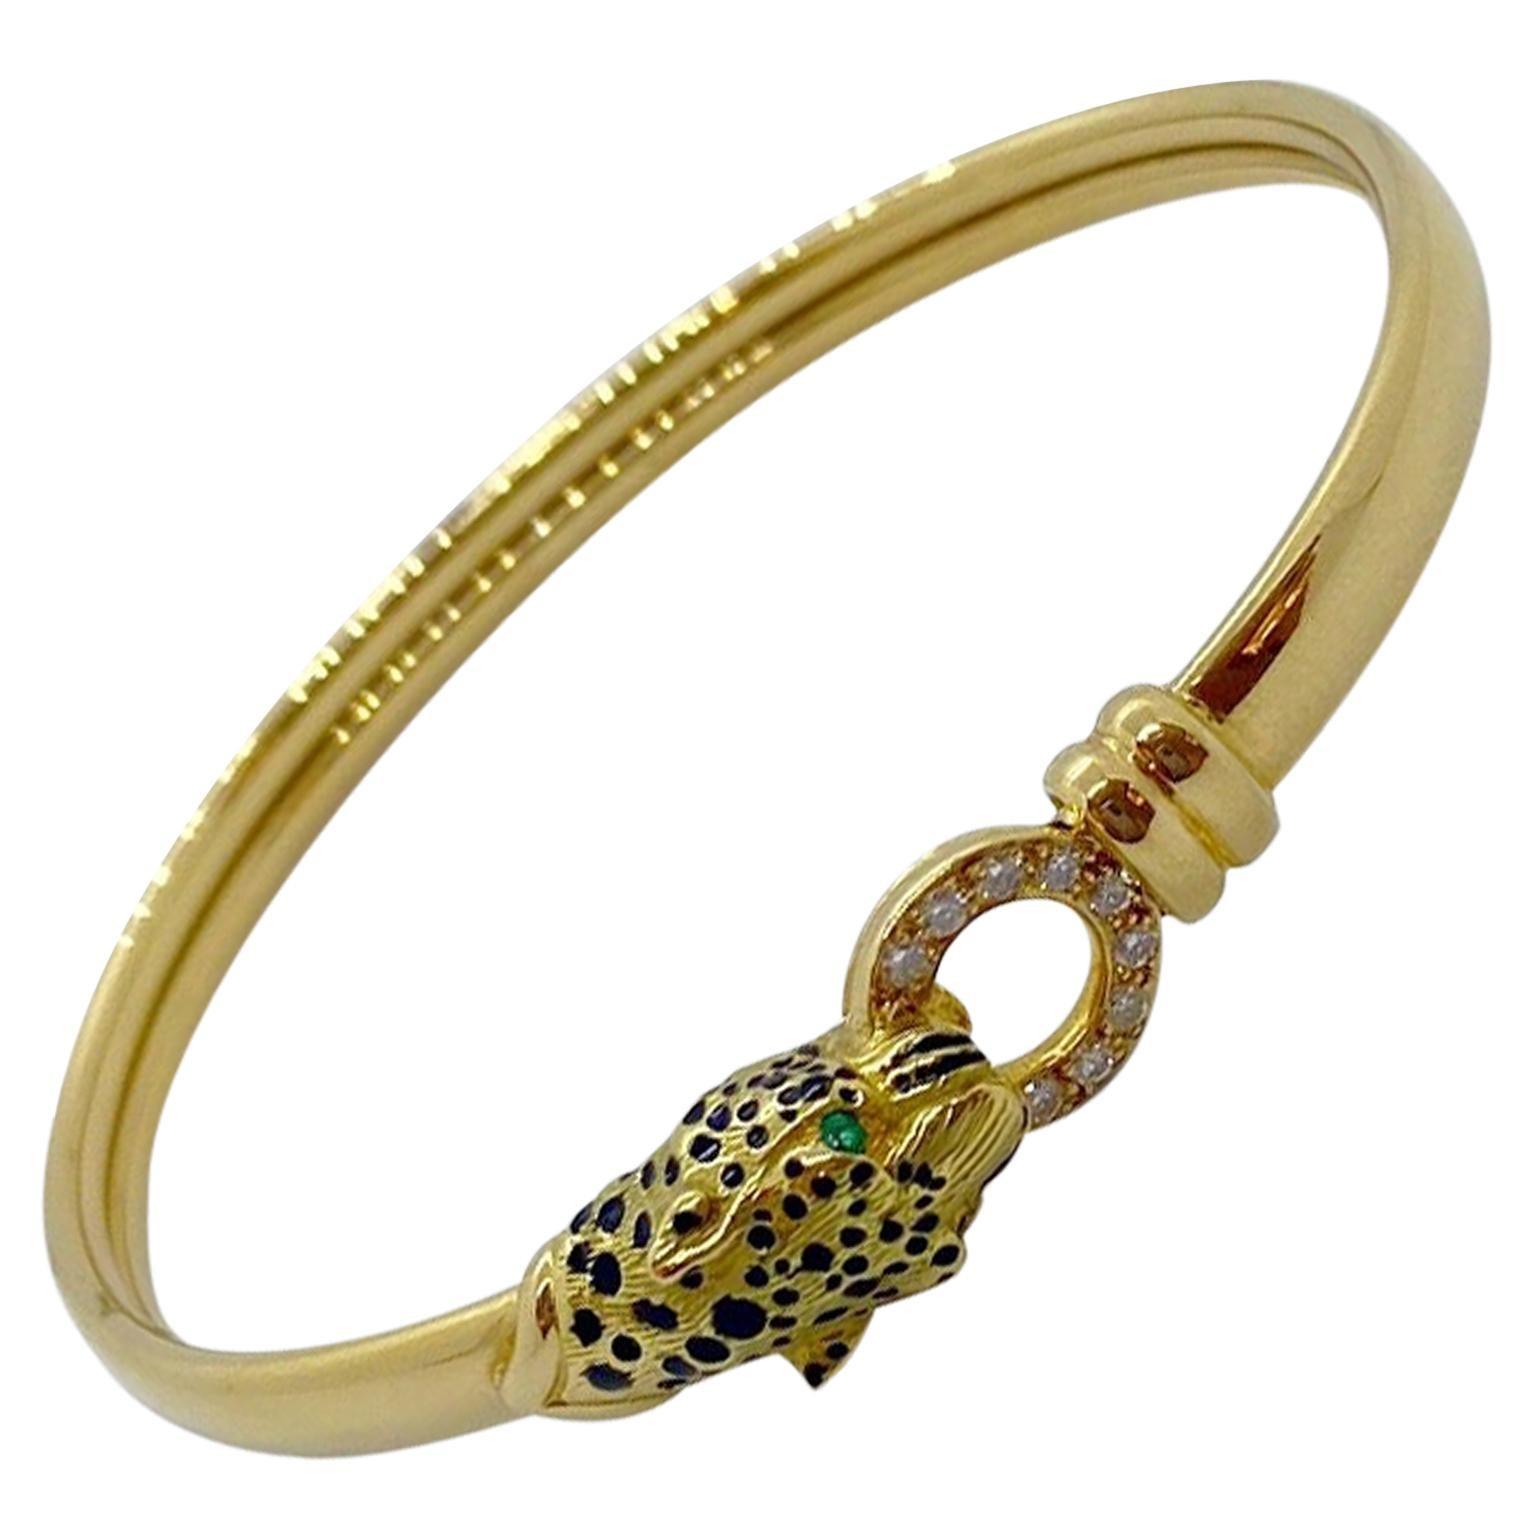 18 Karat Gold Panther Head Bangle Bracelet with Diamonds, Emeralds and Enamel